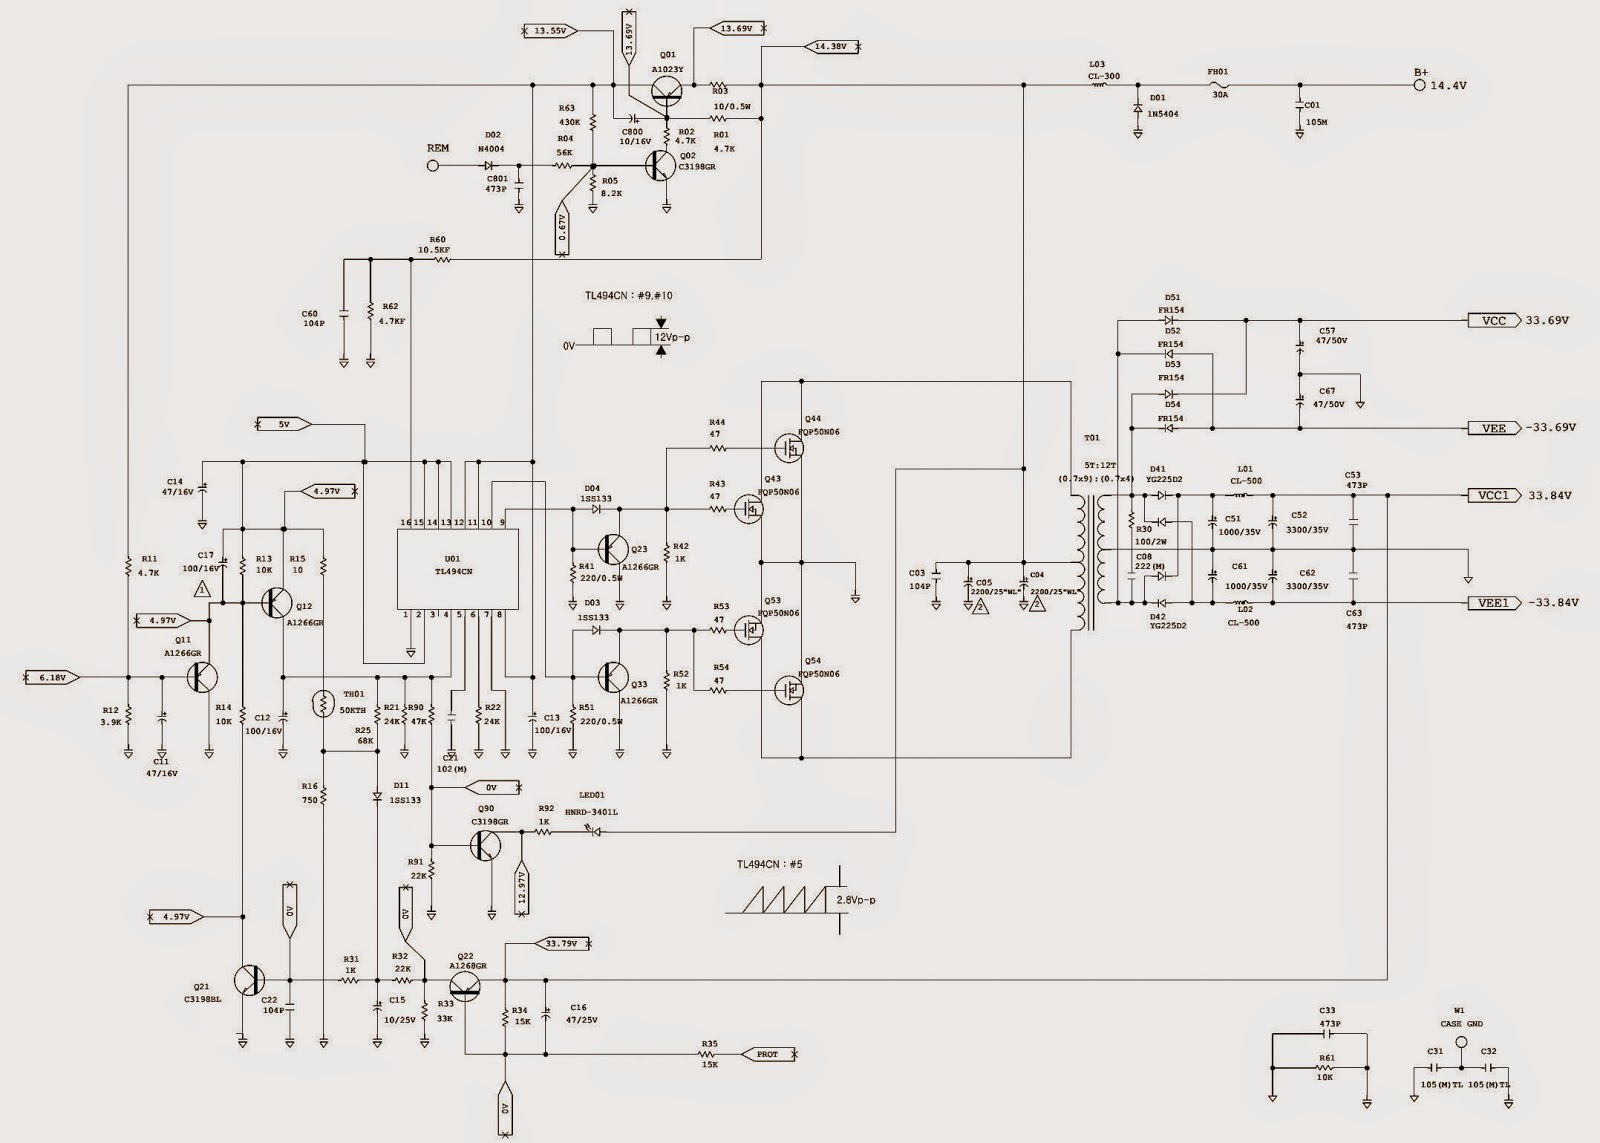 medium resolution of jbl car audio gto 75 2 wiring diagram installation 2006 gto wiring diagram 2006 gto